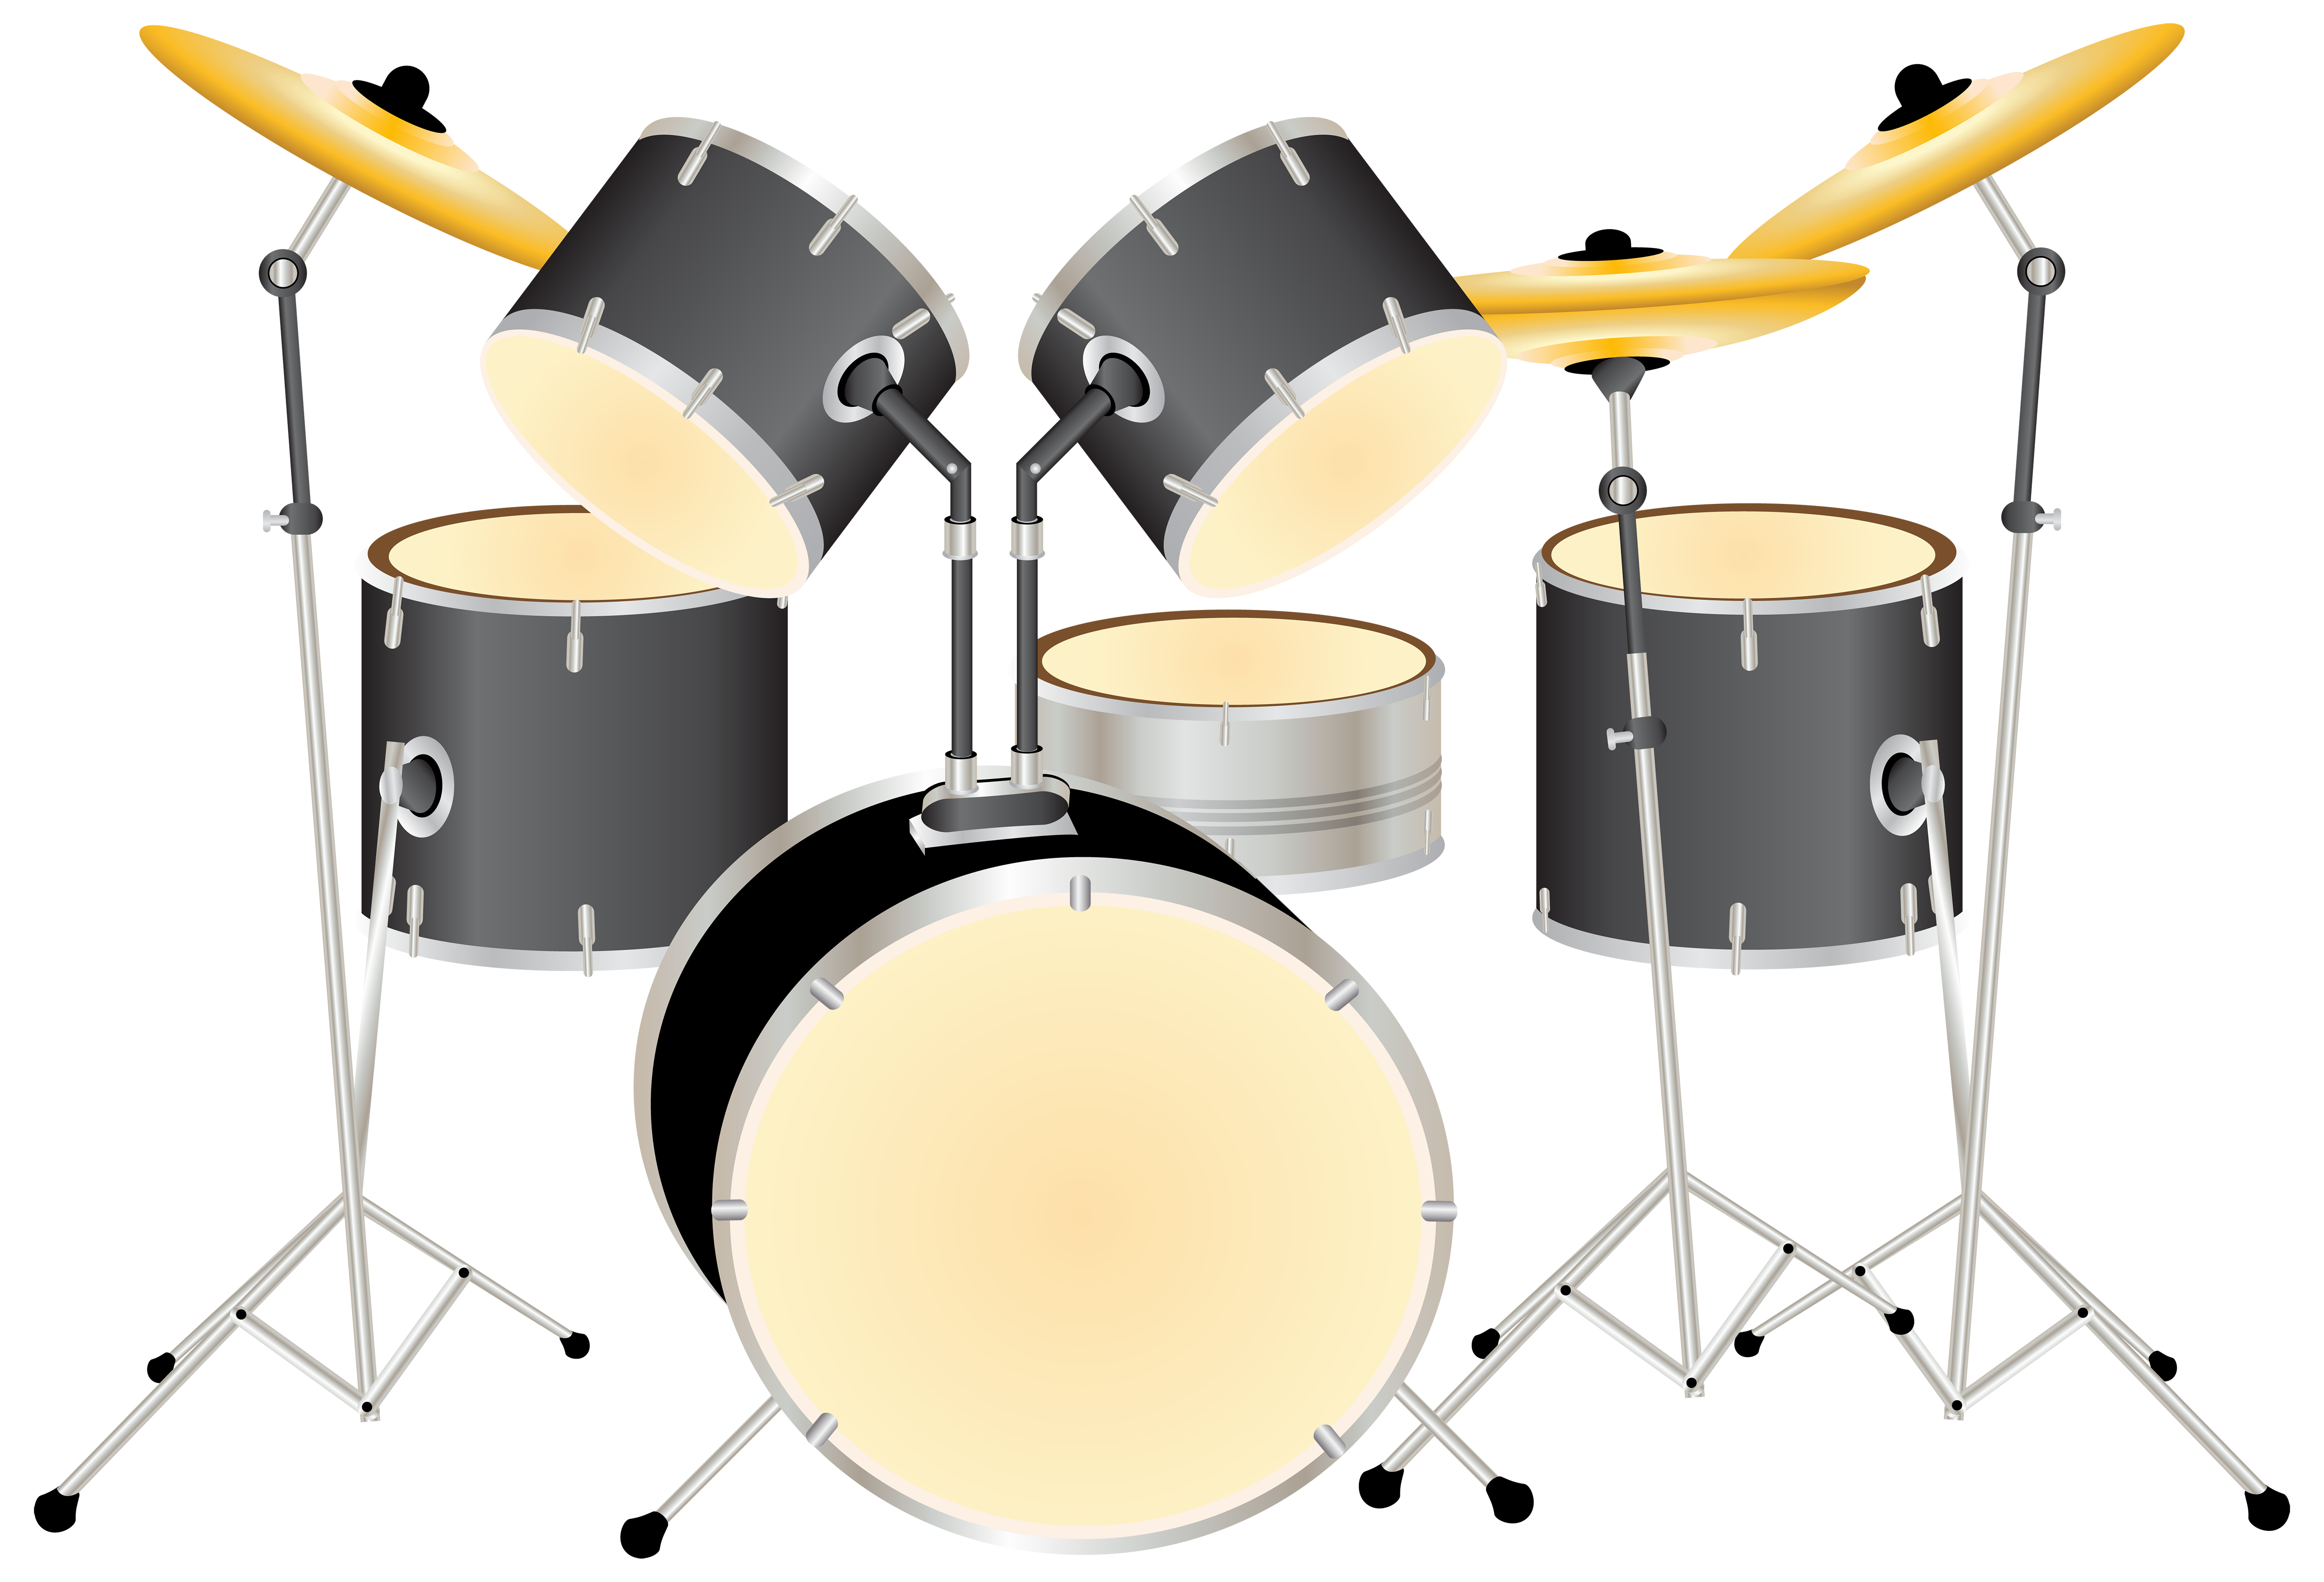 Hands clipart drumming. Drum kit png best